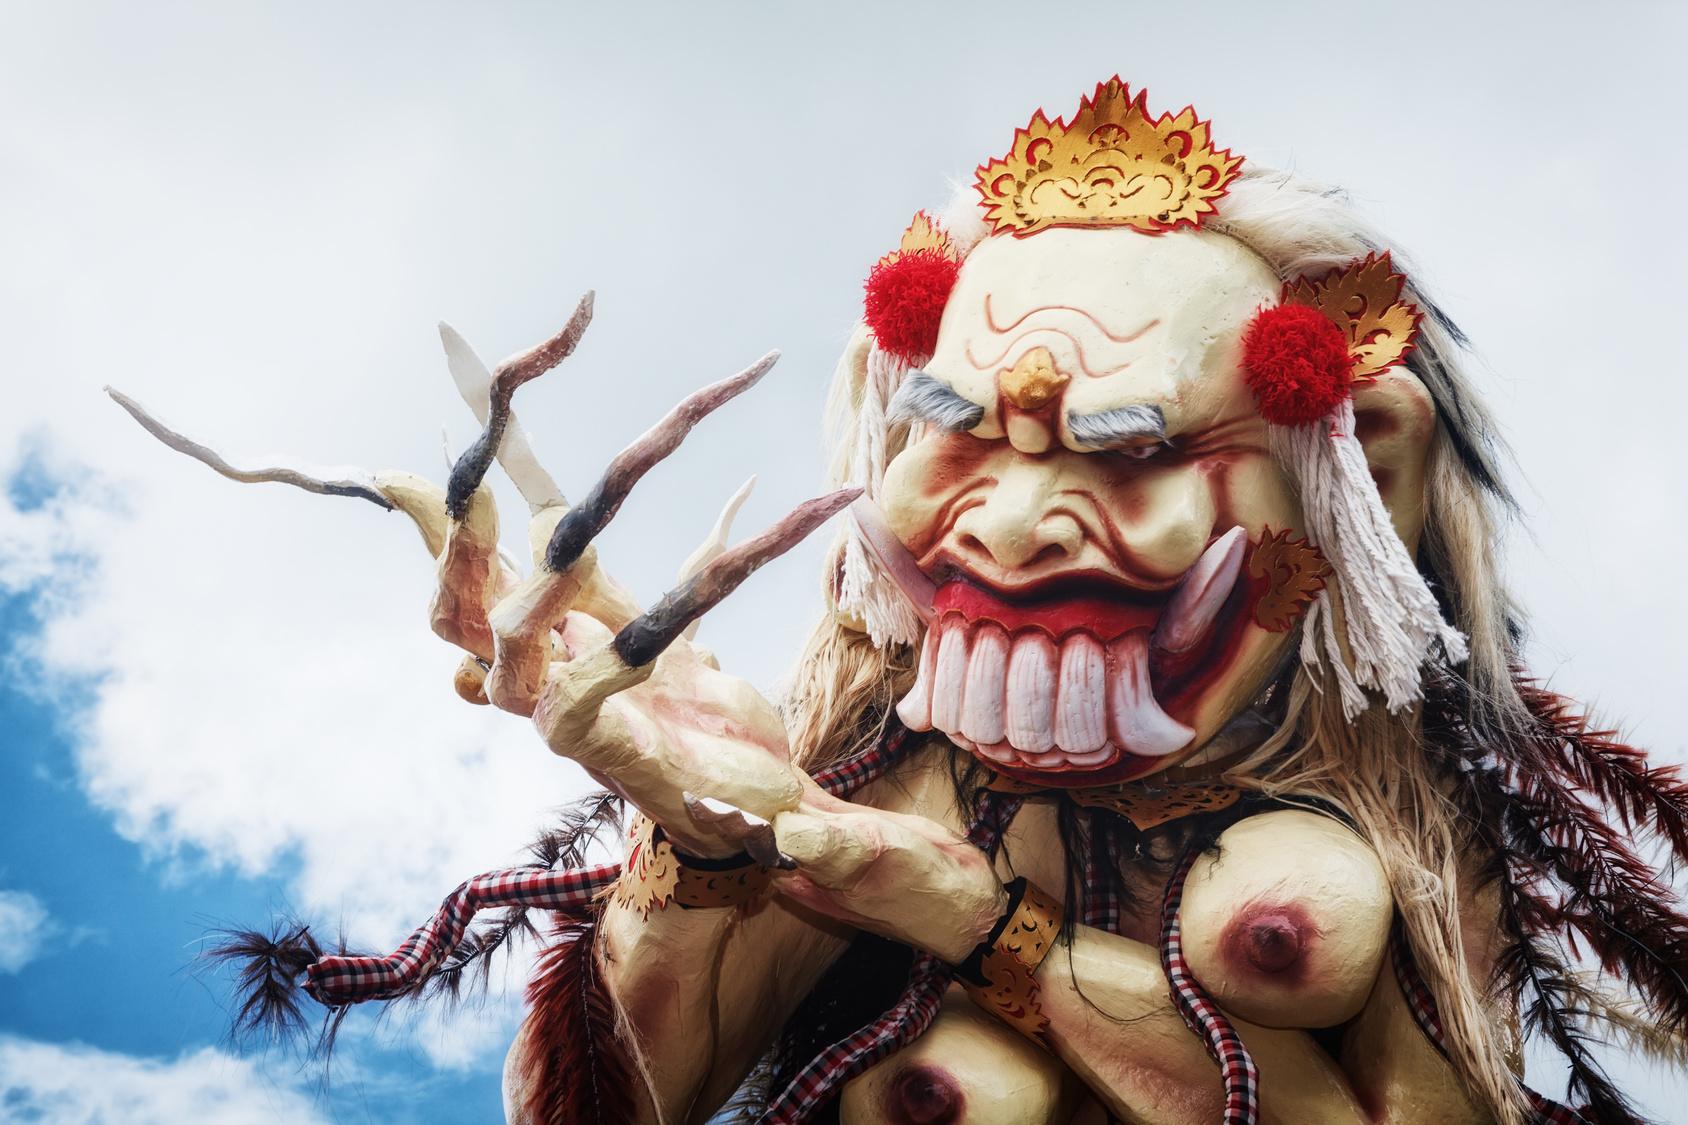 rangda, ogoh ogoh, balijski demon